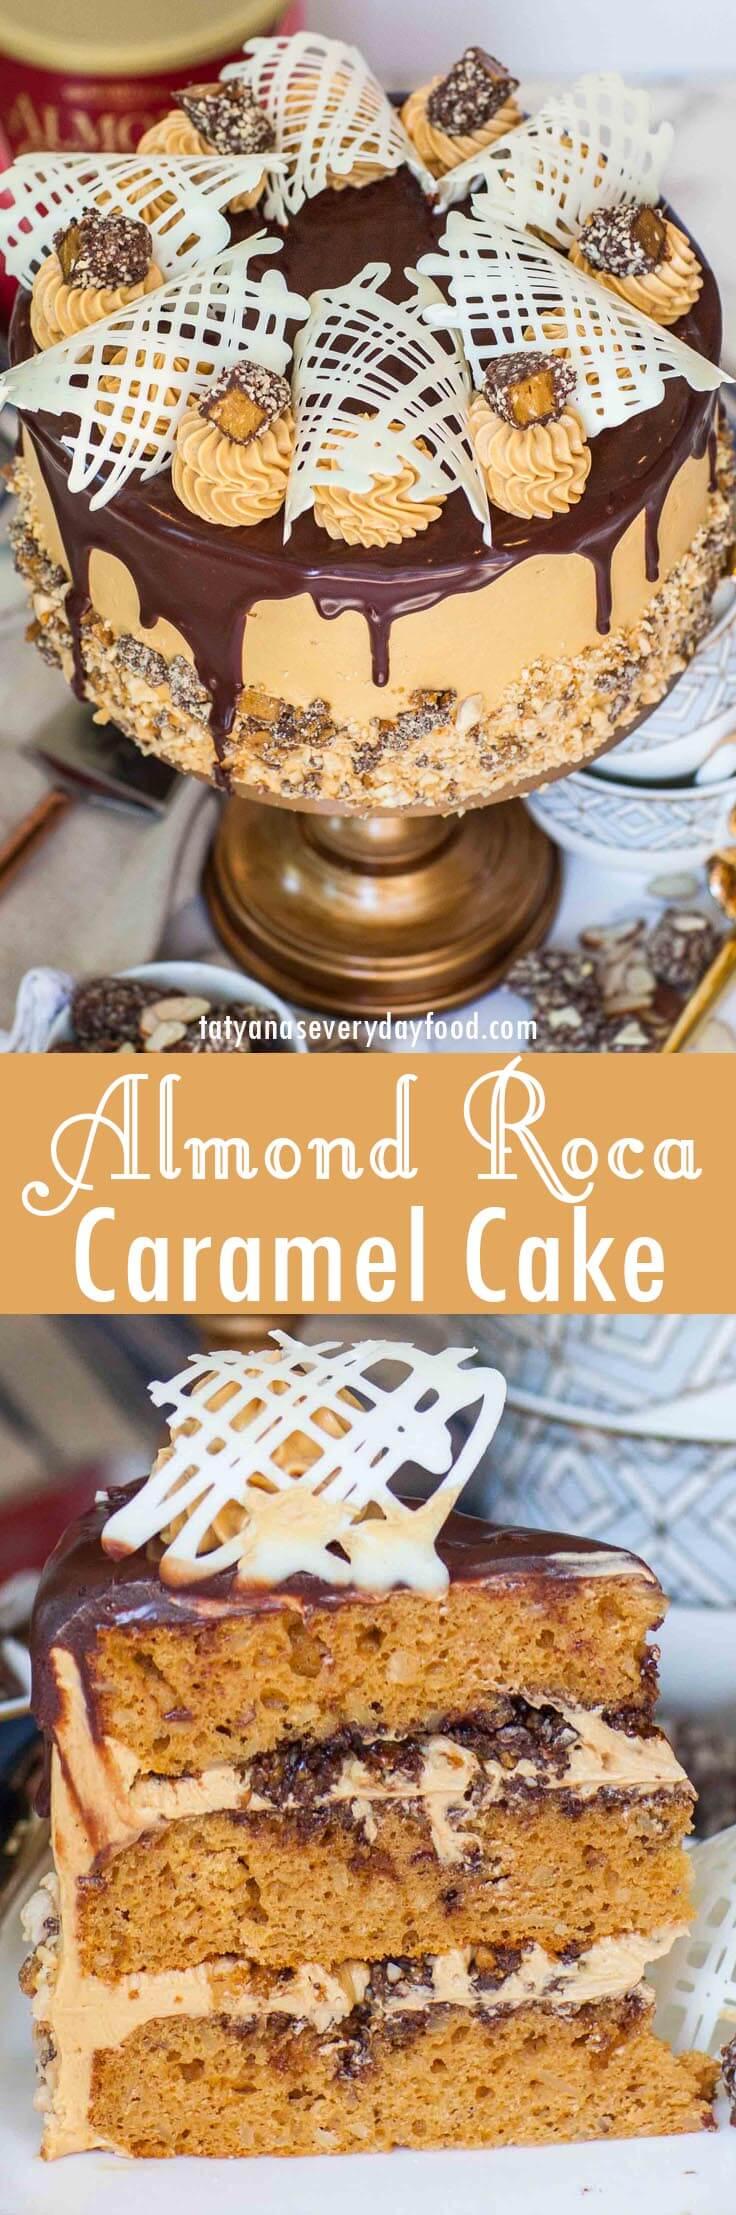 Almond Roca Caramel Cake video recipe